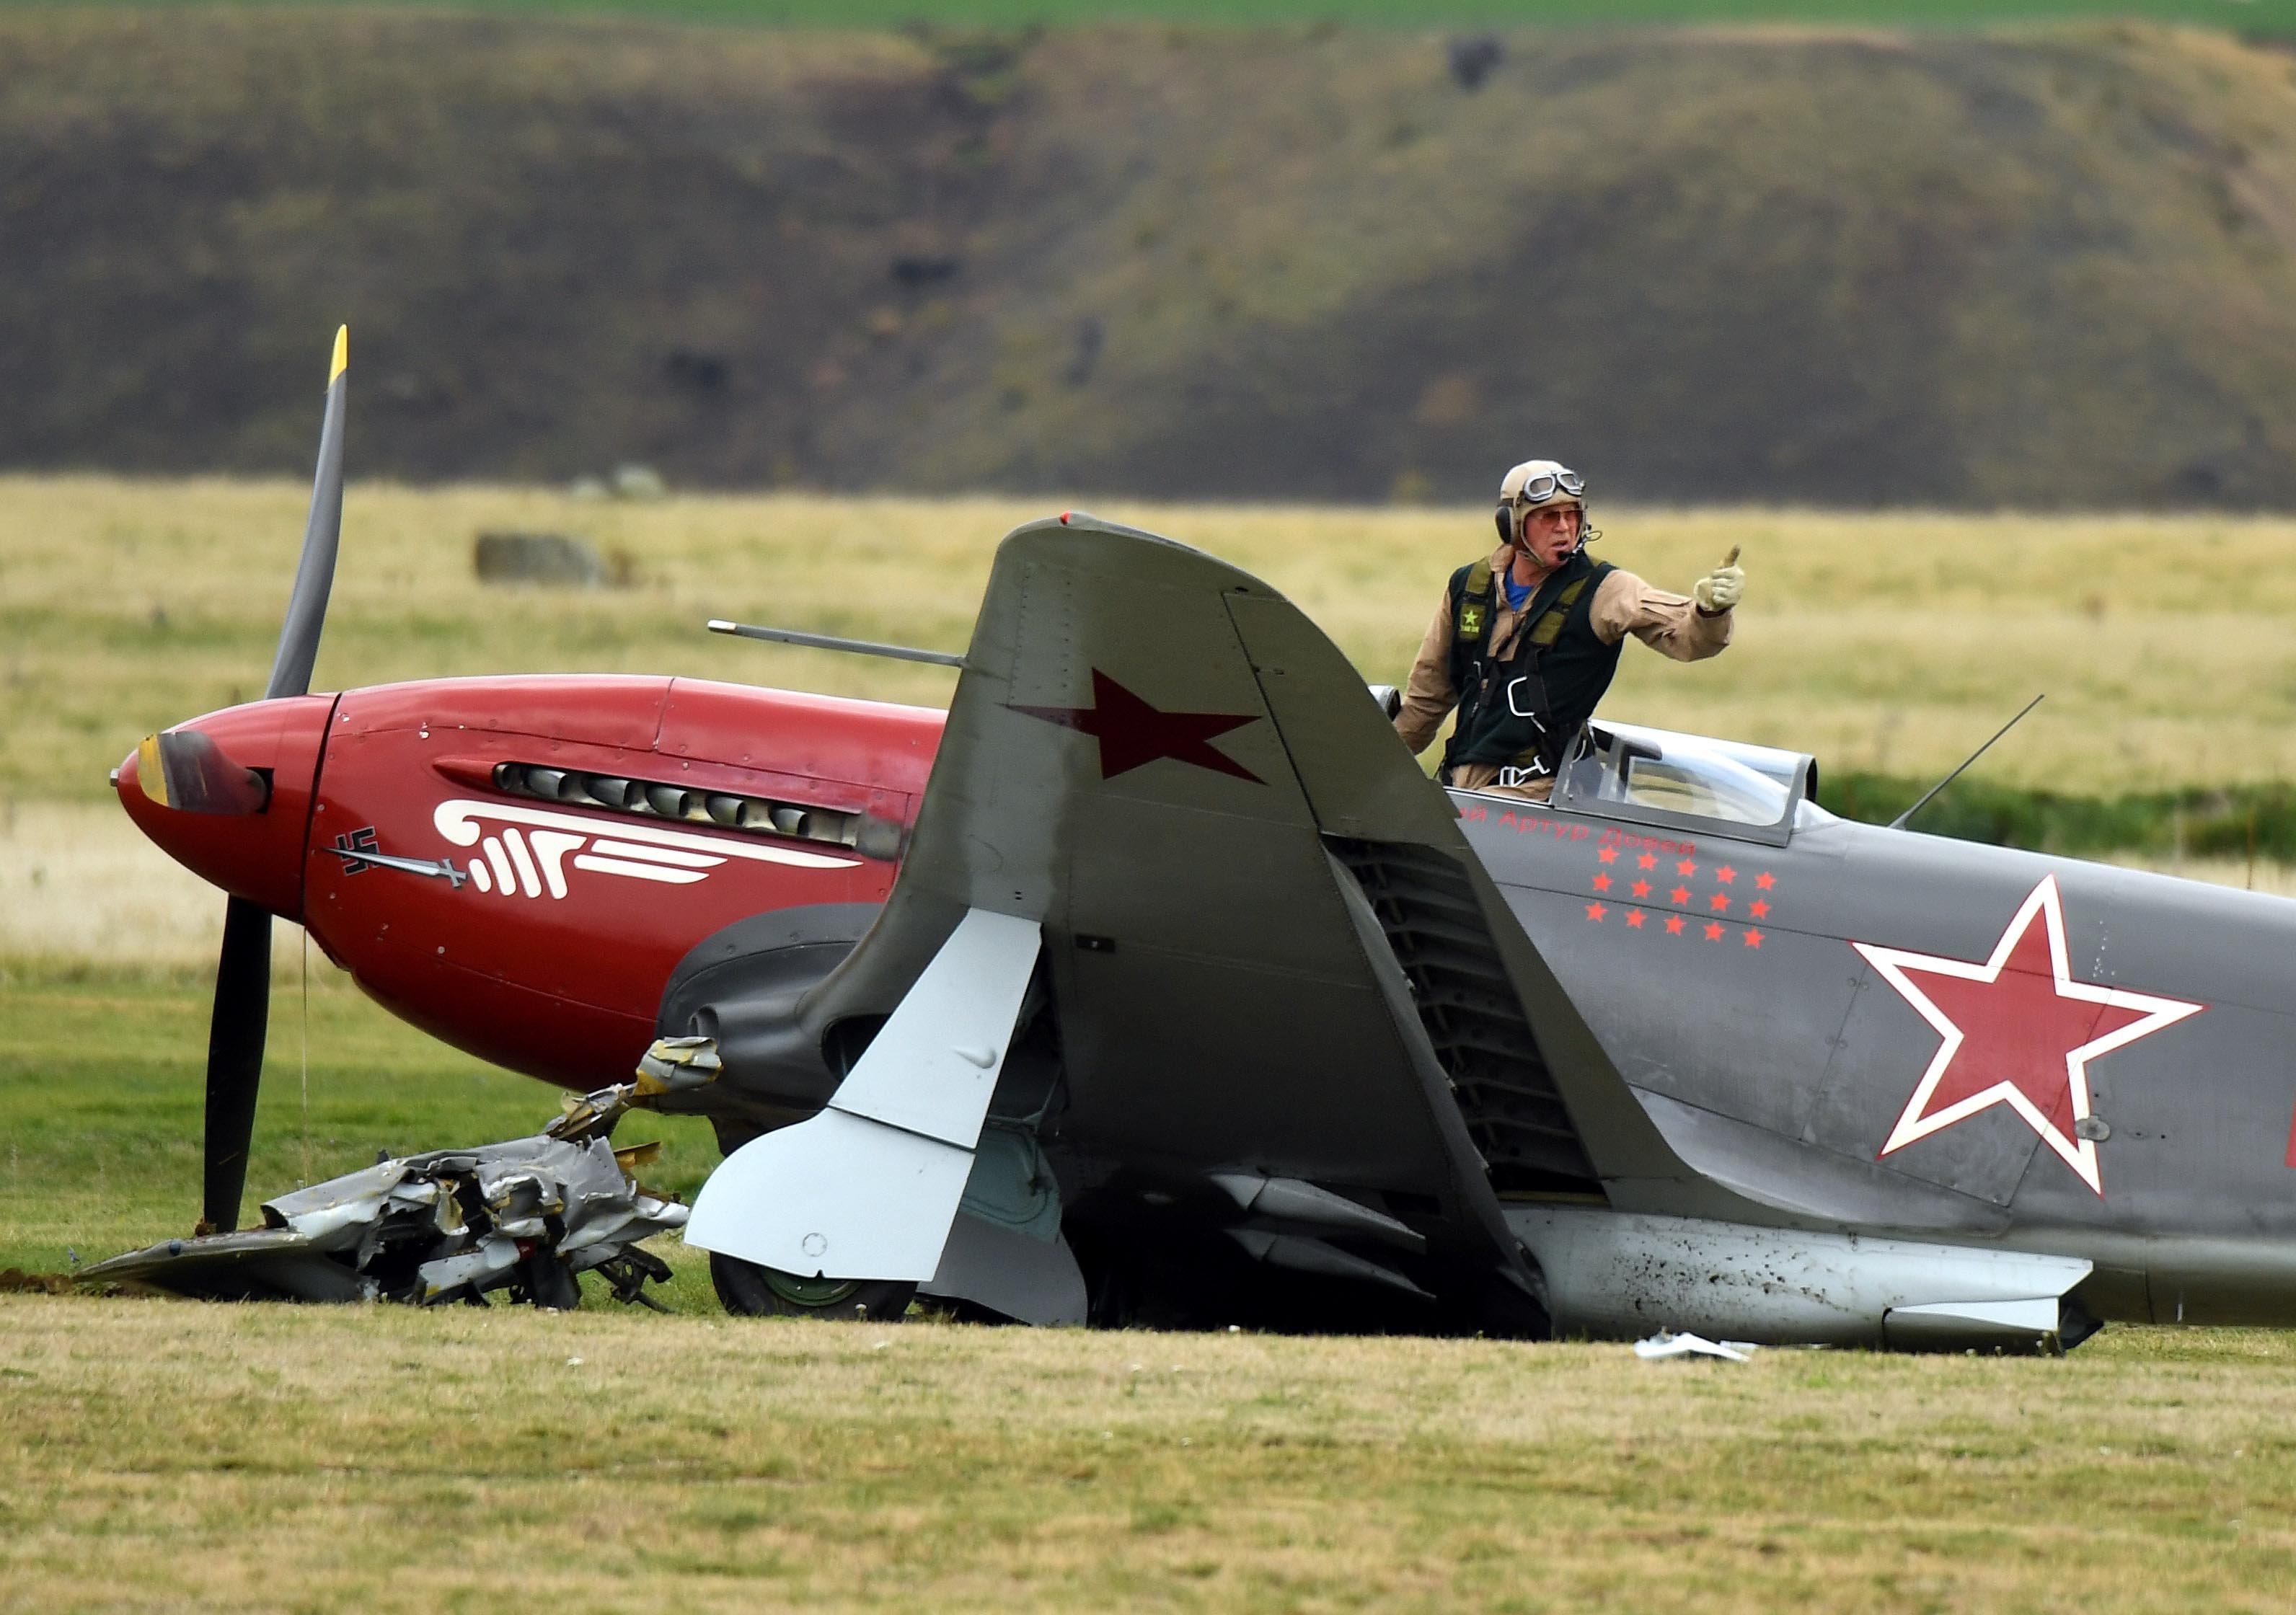 Warbird pilot sues organisers | Otago Daily Times Online News